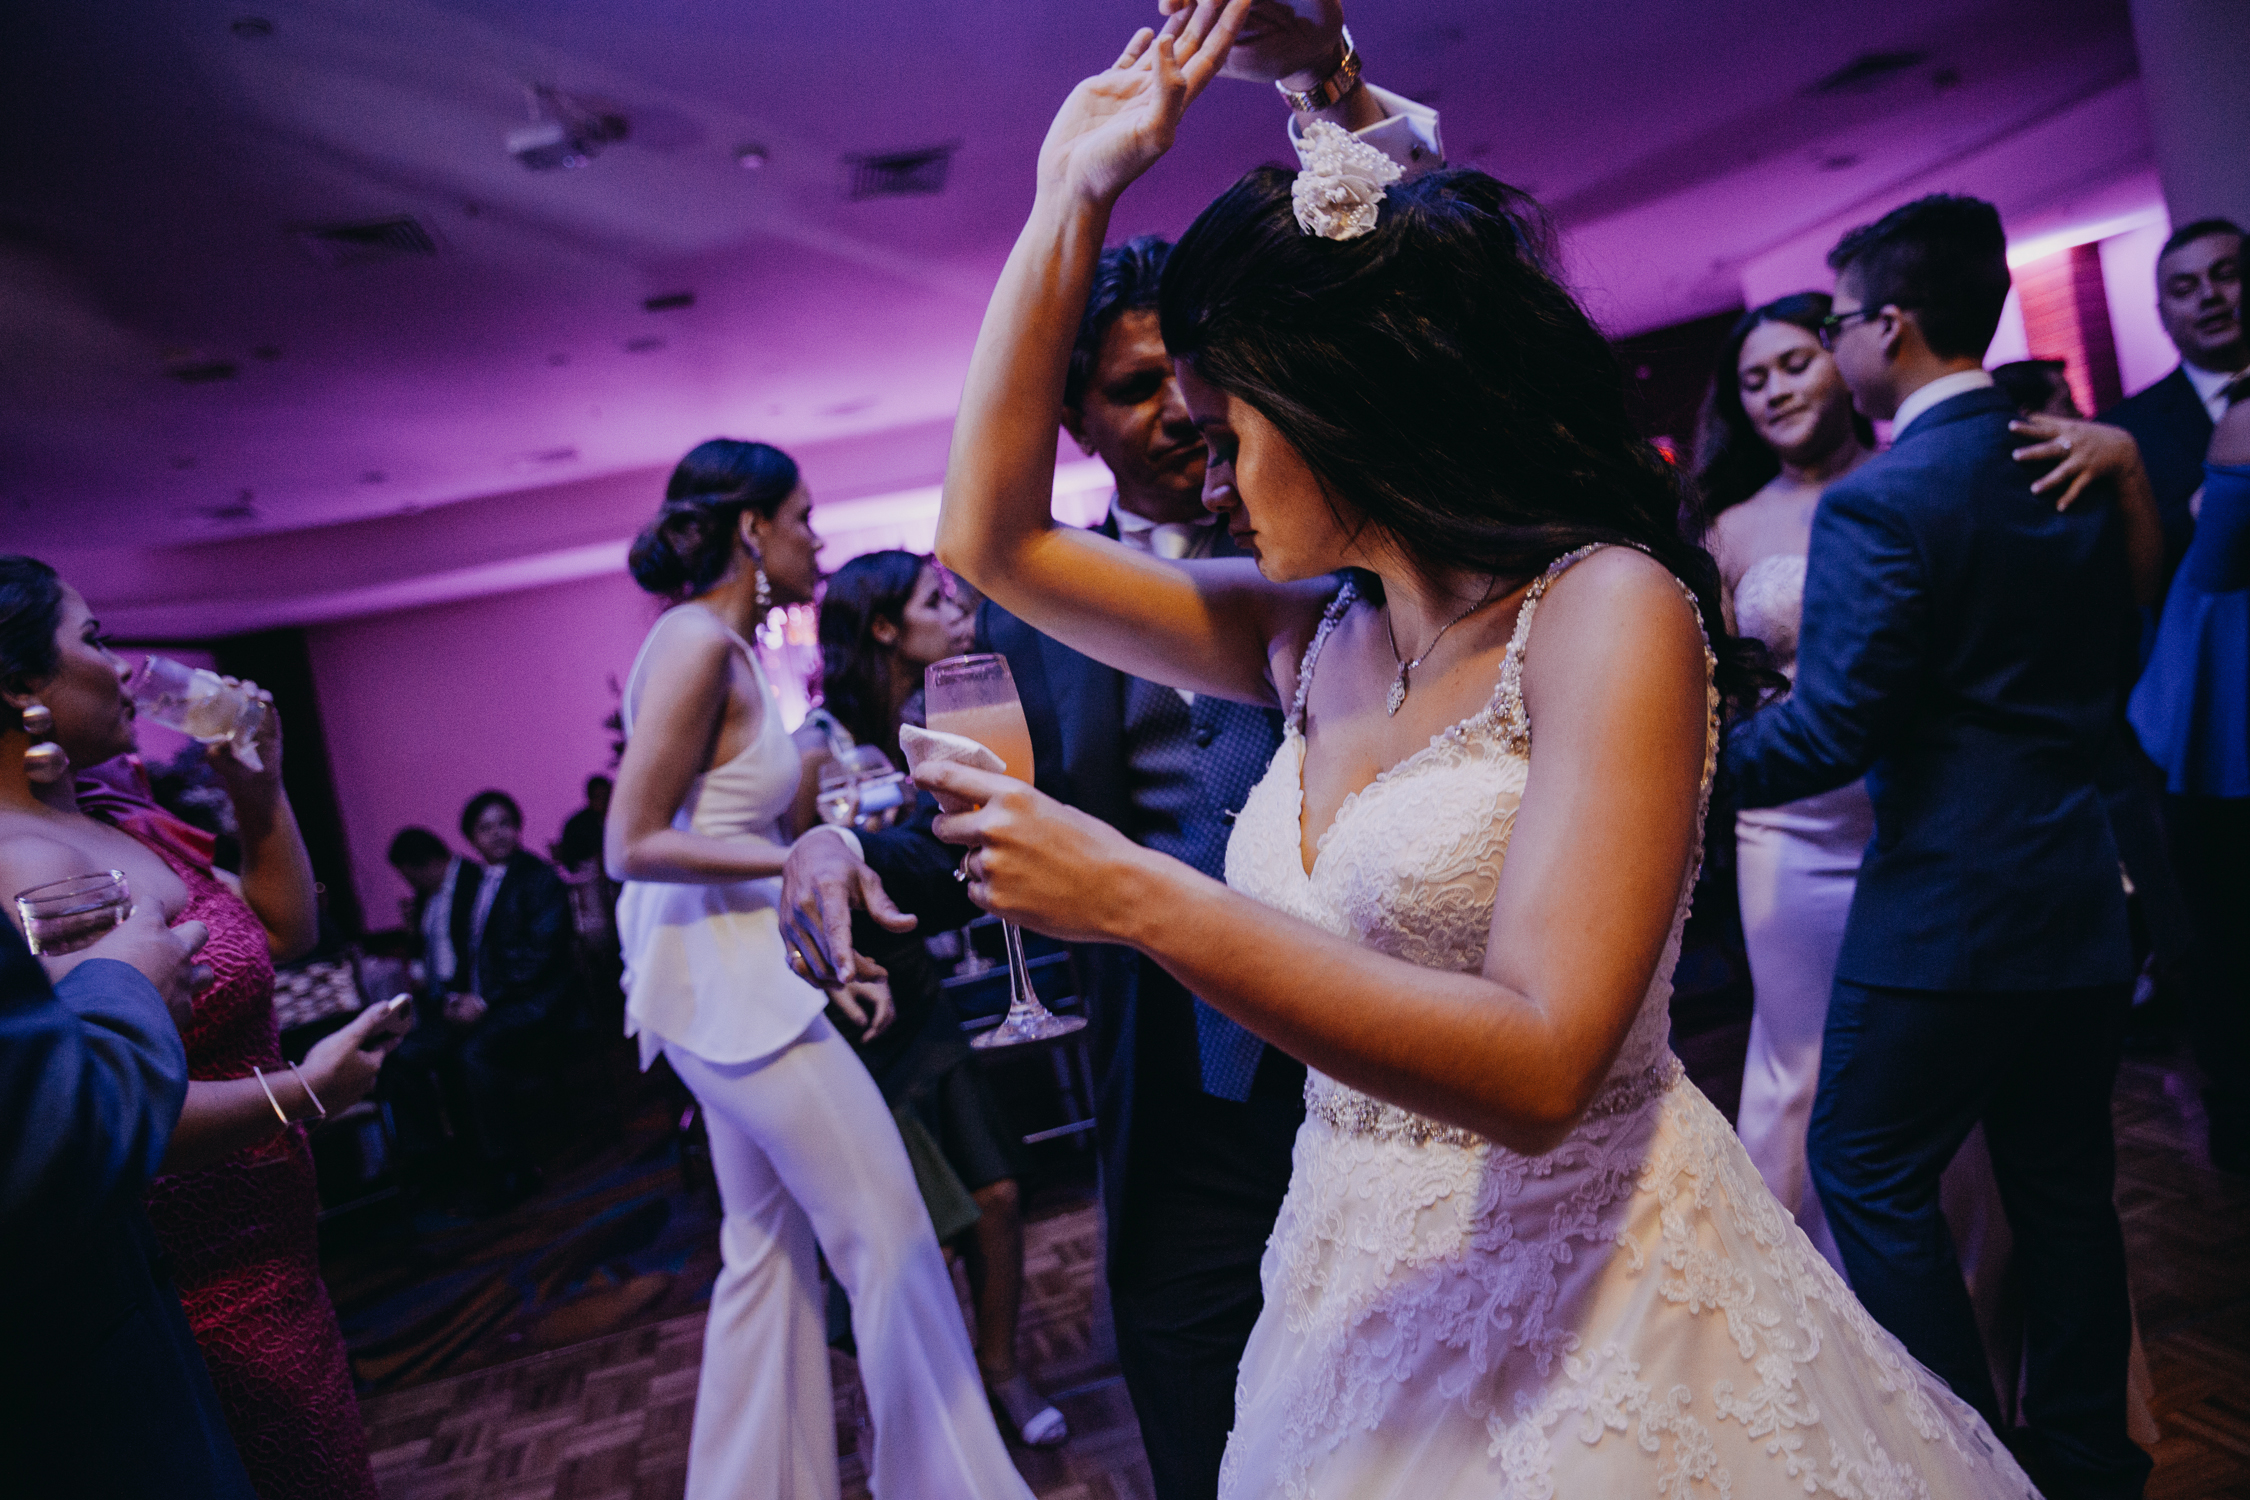 Michelle-Agurto-Fotografia-Bodas-Ecuador-Destination-Wedding-Photographer-Daniela-Dirk-96.JPG